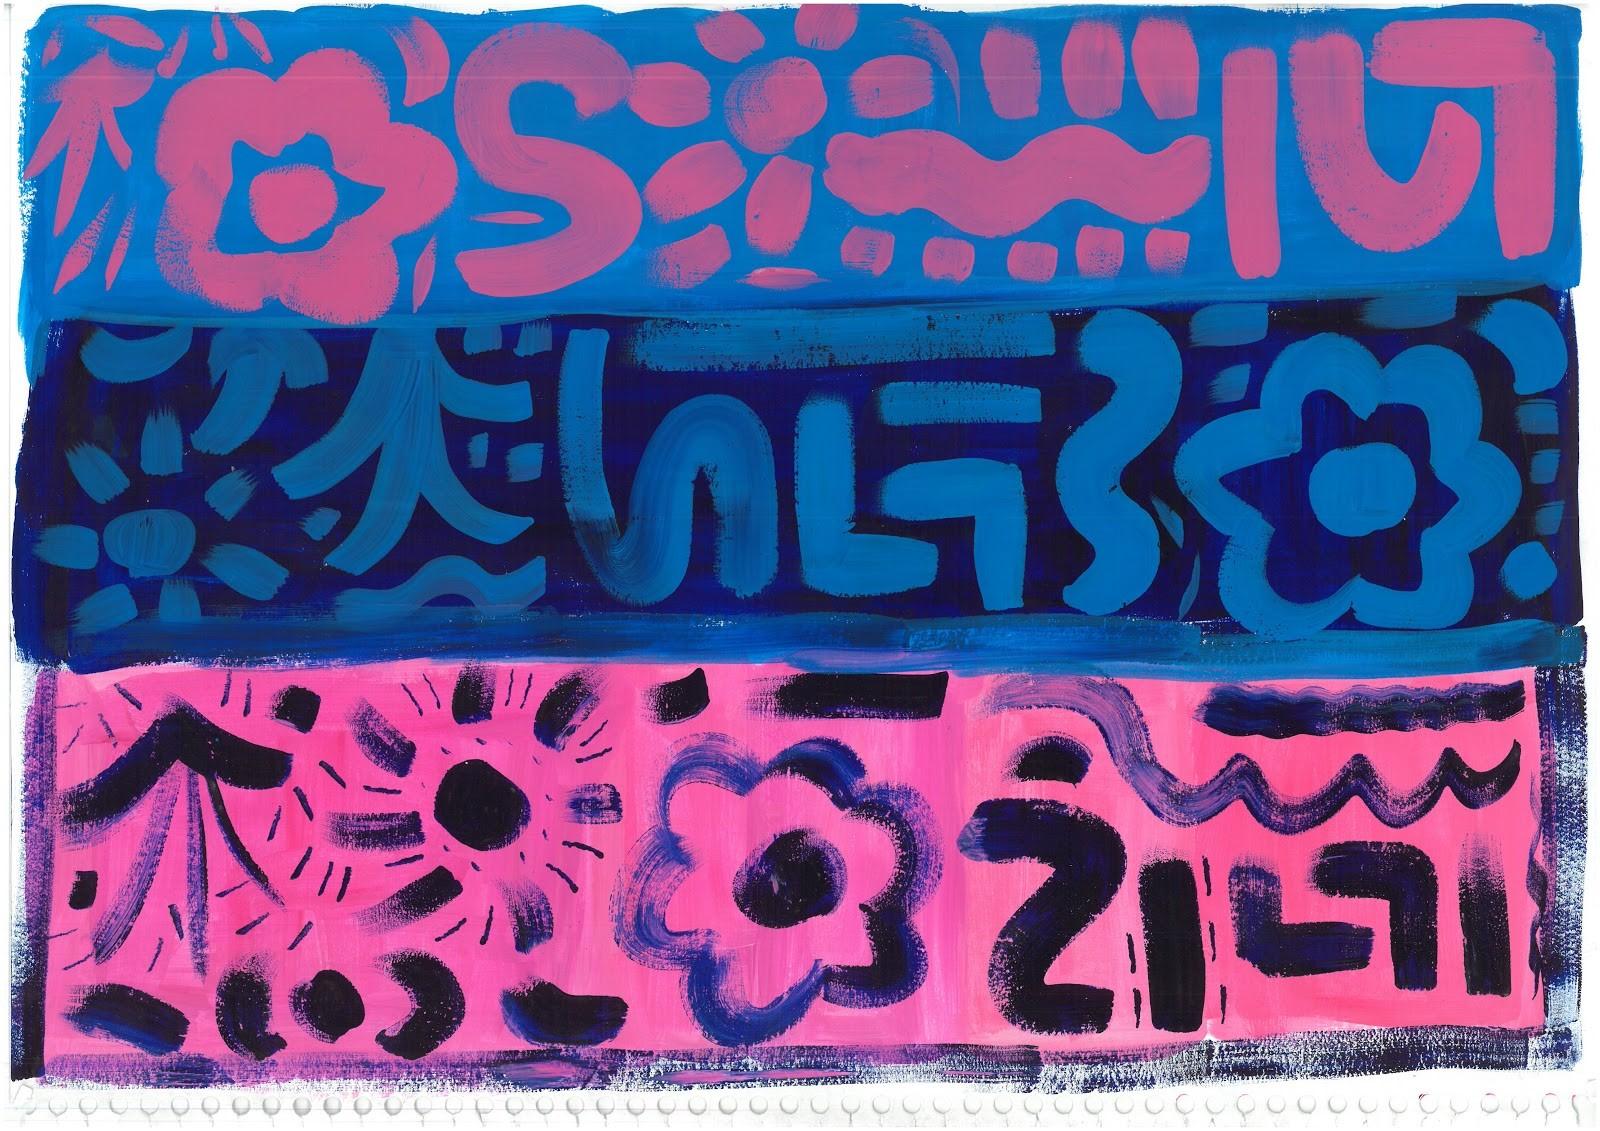 Painted Love fabric design - Original scan.